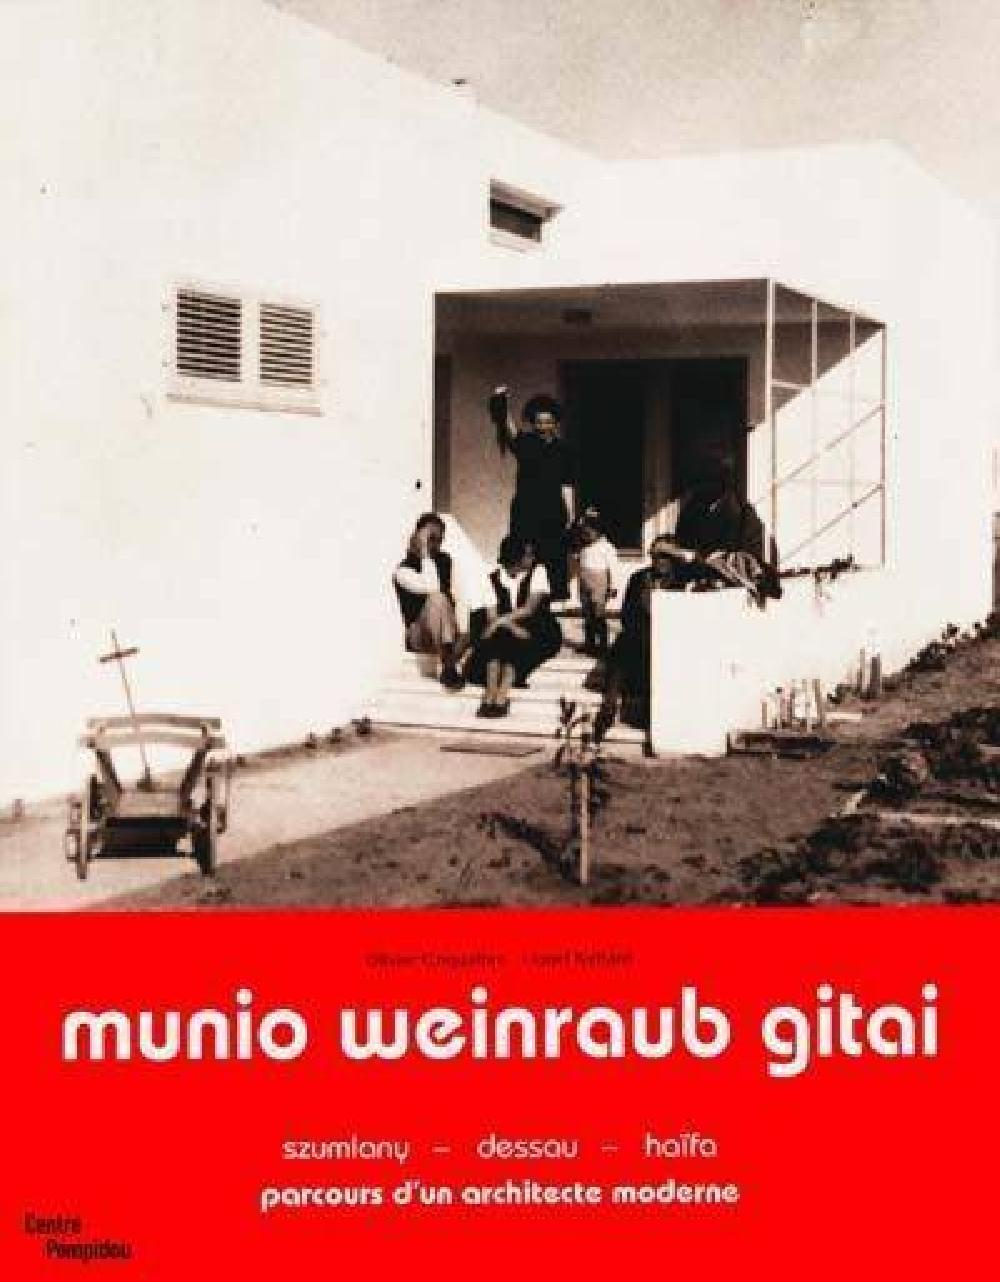 Munio Weinraub Gitai Parcours d'un architecte moderne